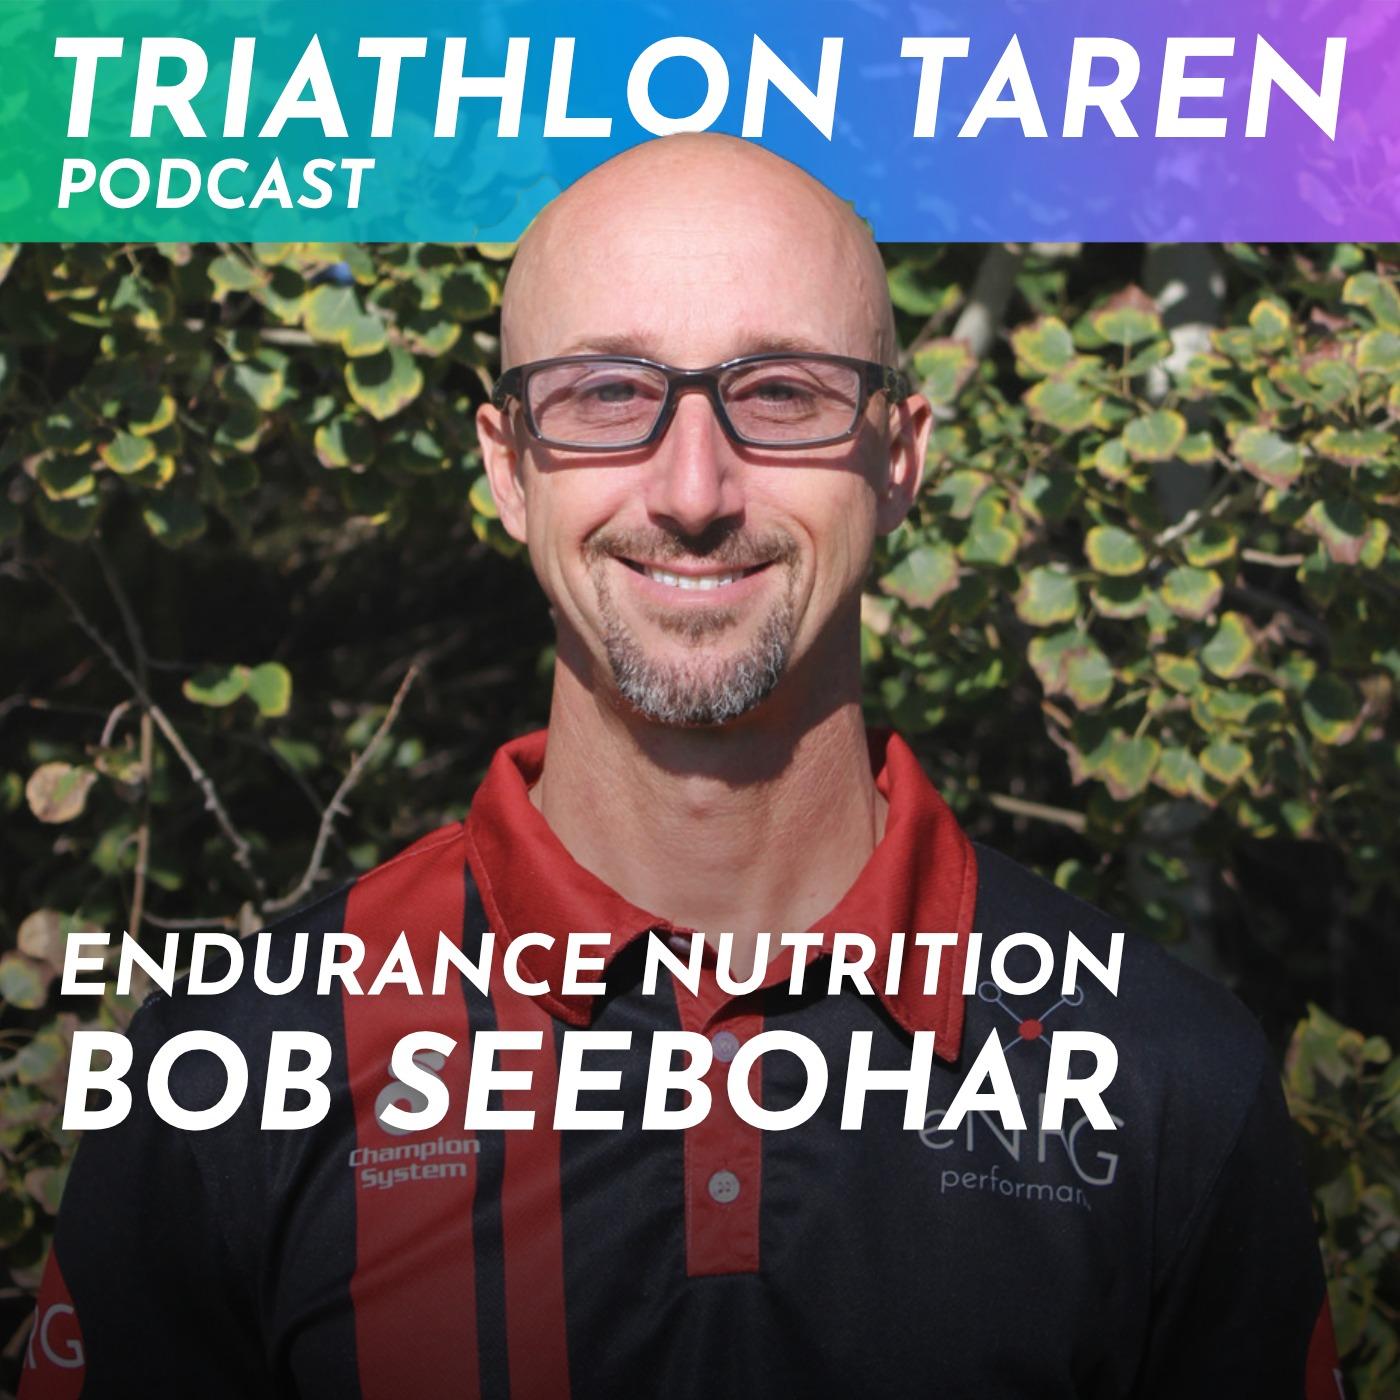 Superior Endurance Nutrition with Sports Dietitian Bob Seebohar